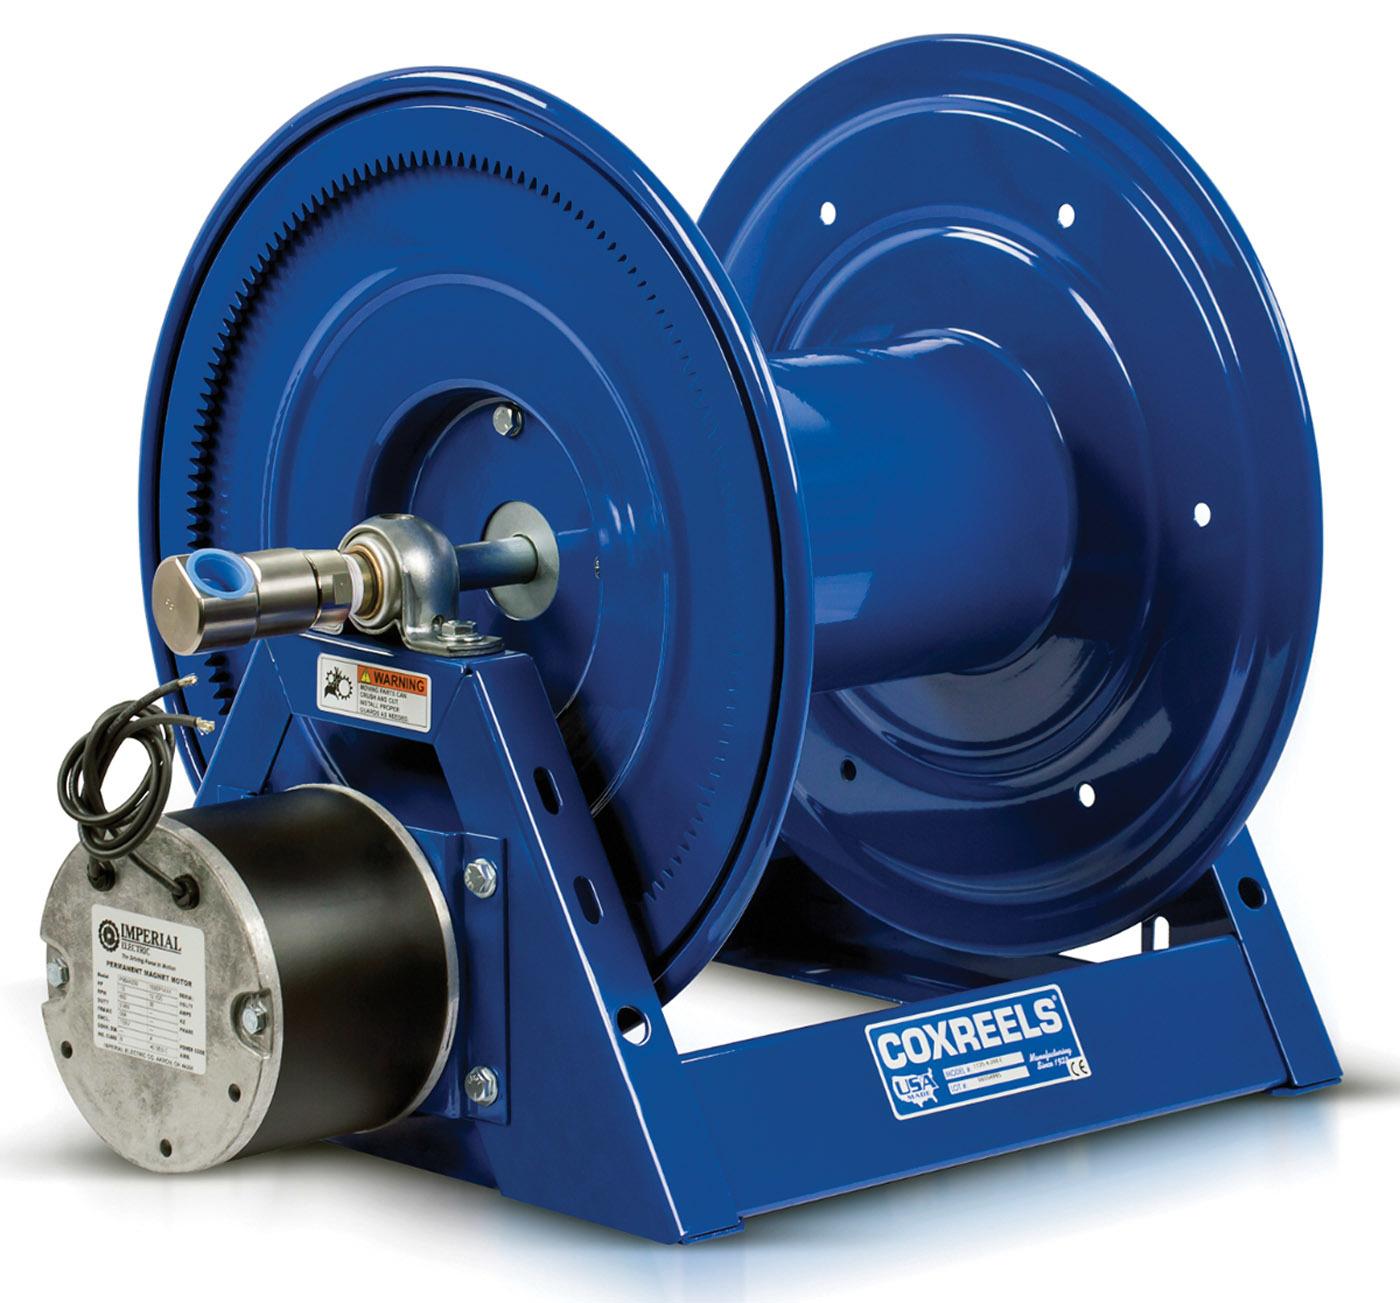 Lowpressure Electric Fuel Pump At Ireland Engineering Performance